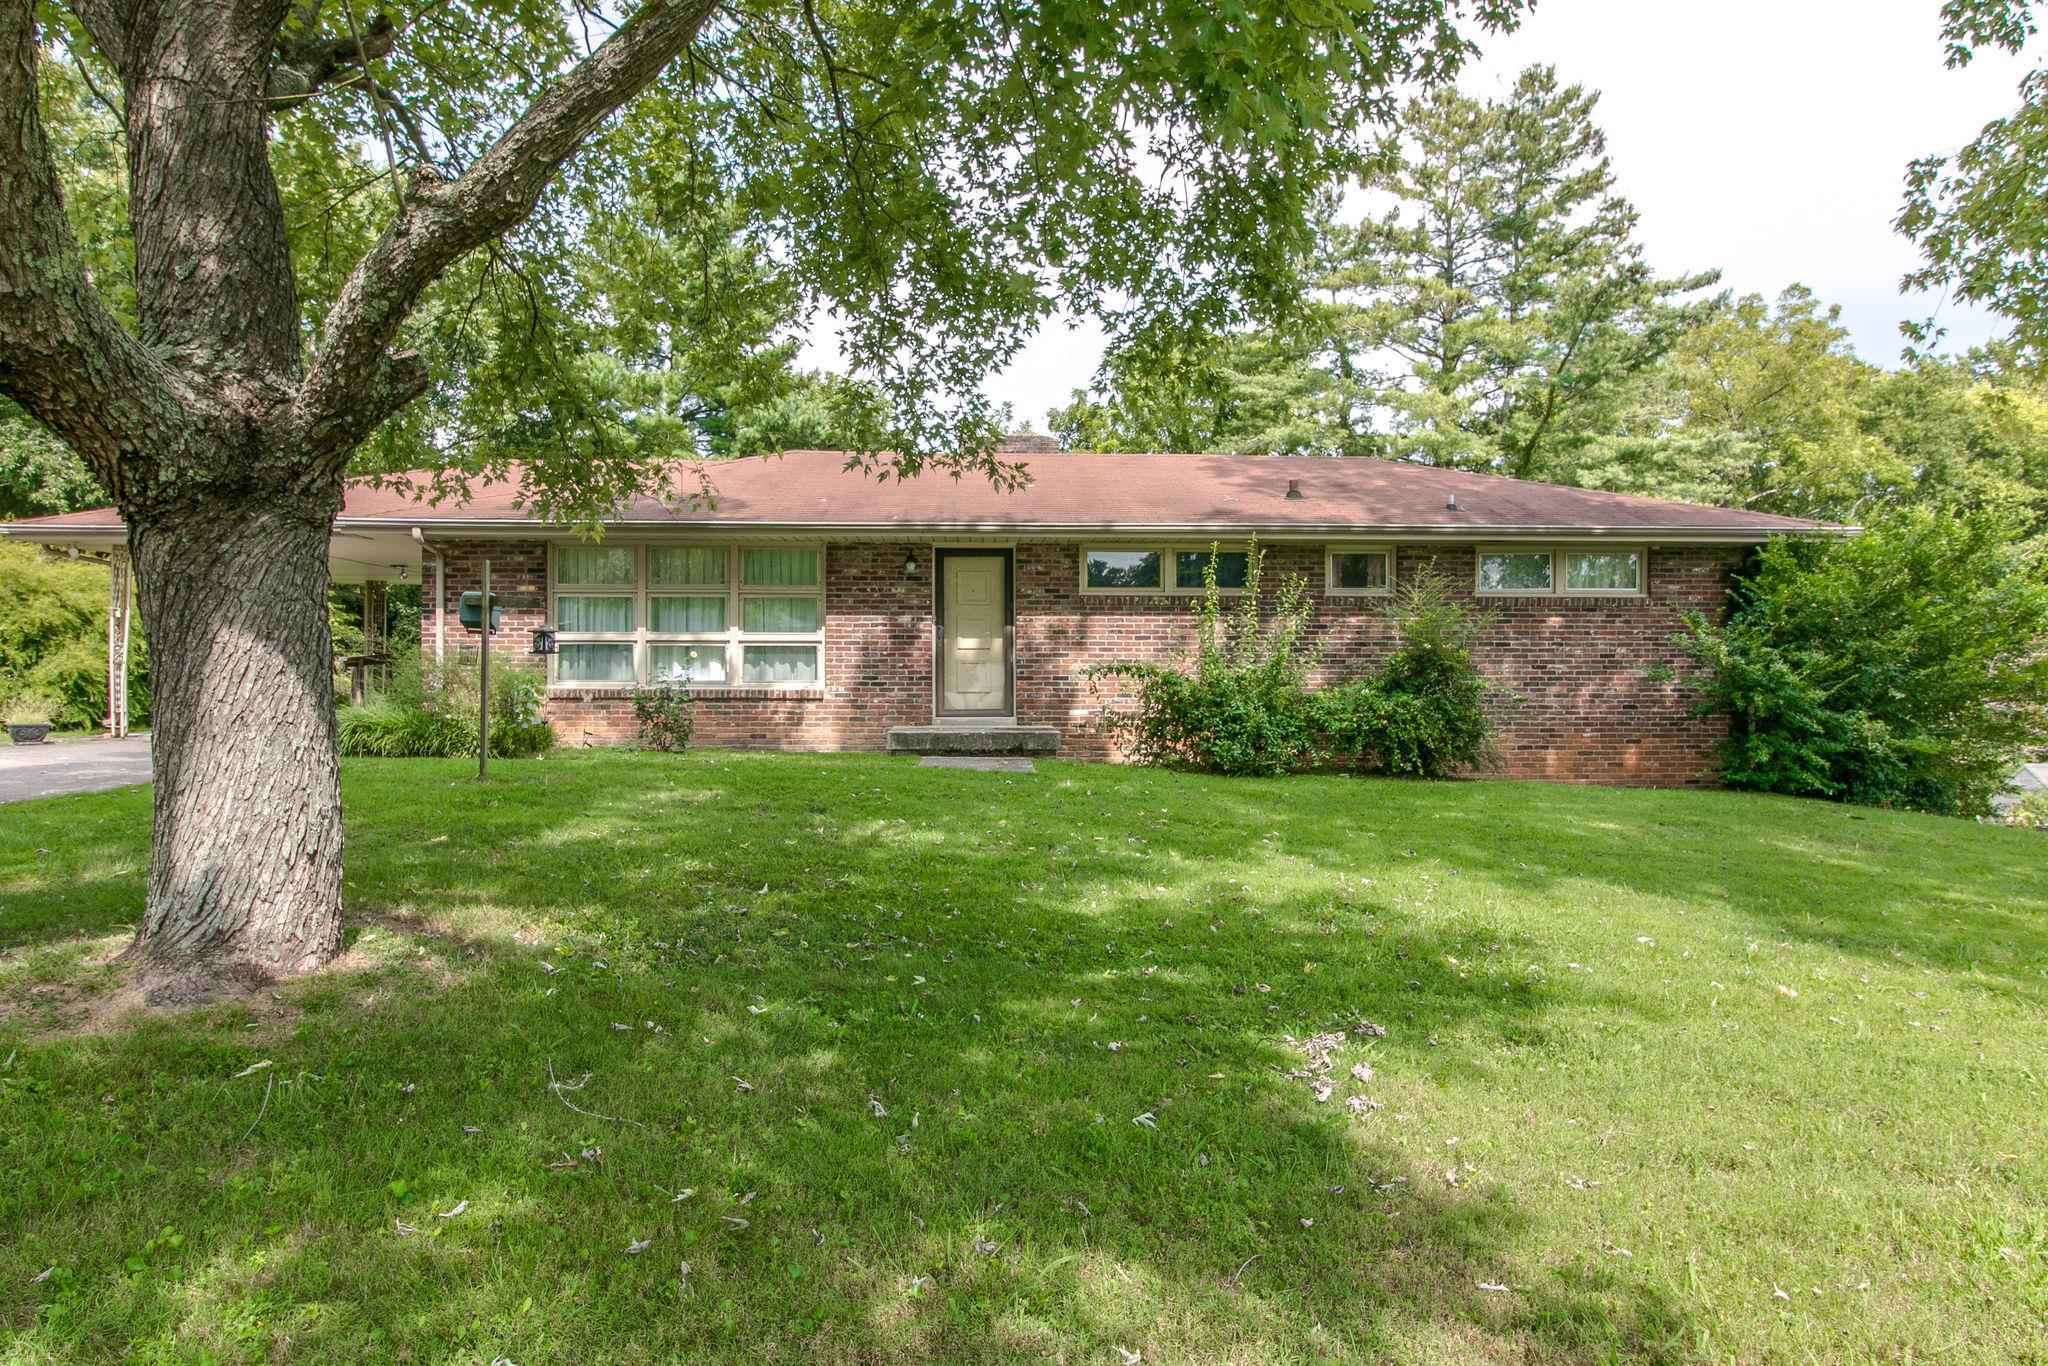 911 Branch Rd, Clarksville, TN 37043 - Clarksville, TN real estate listing